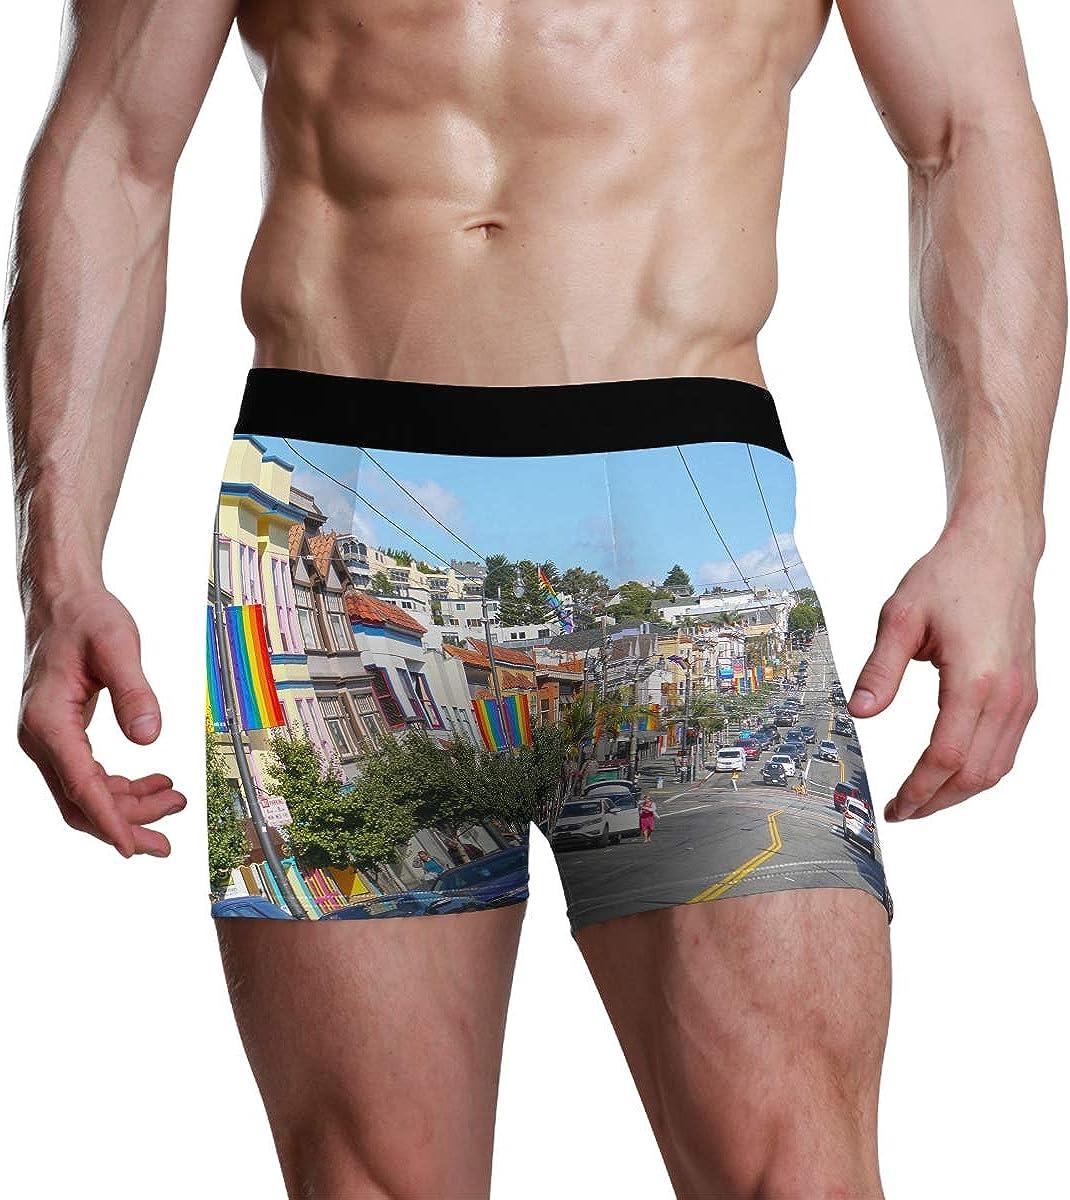 Mens Boxer Briefs San Francisco USA Low Rise Trunks Underwear Breathable Bikini Boys